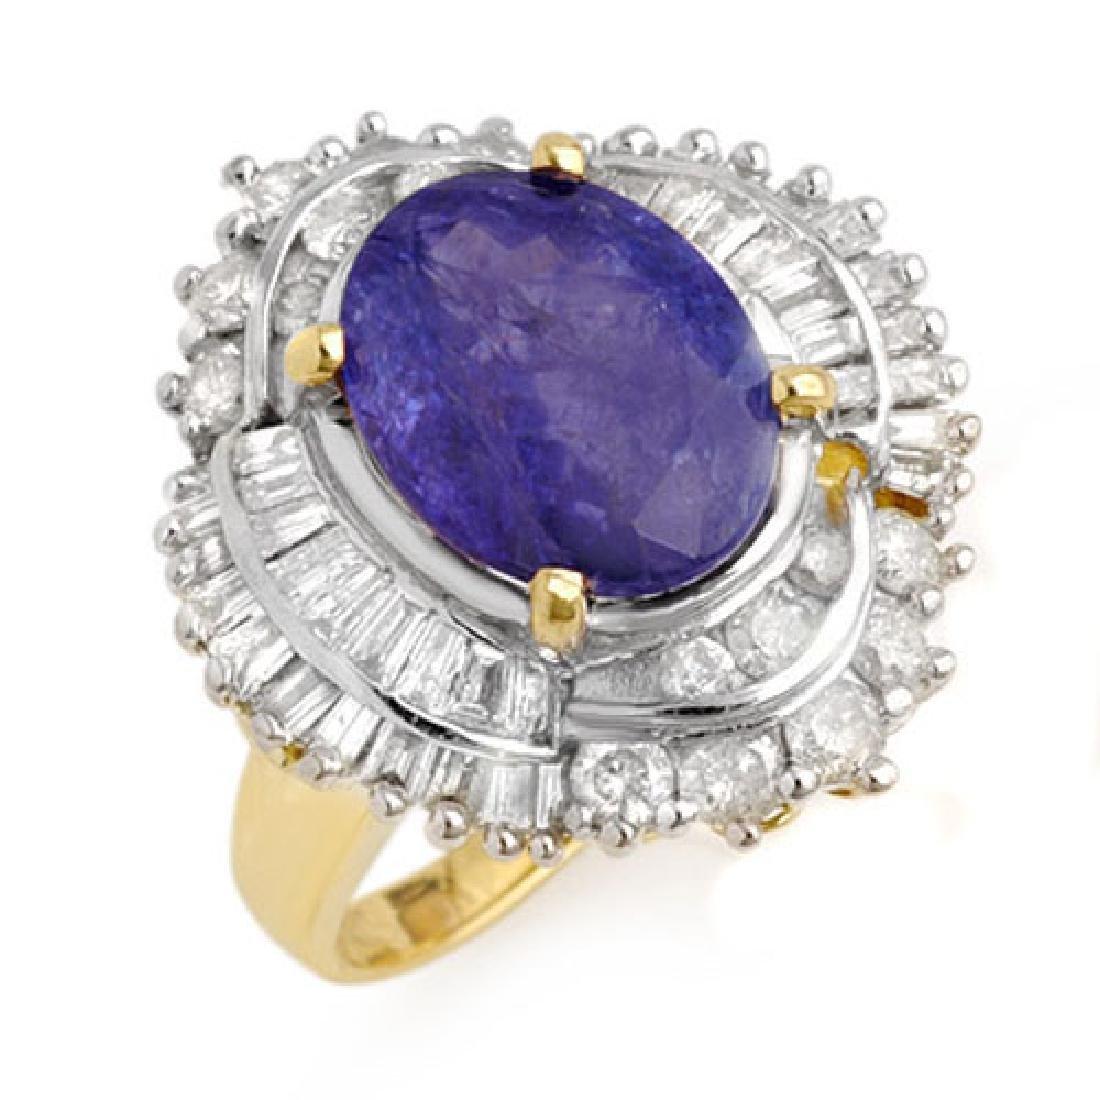 6.0 CTW Tanzanite & Diamond Ring 14K Yellow Gold